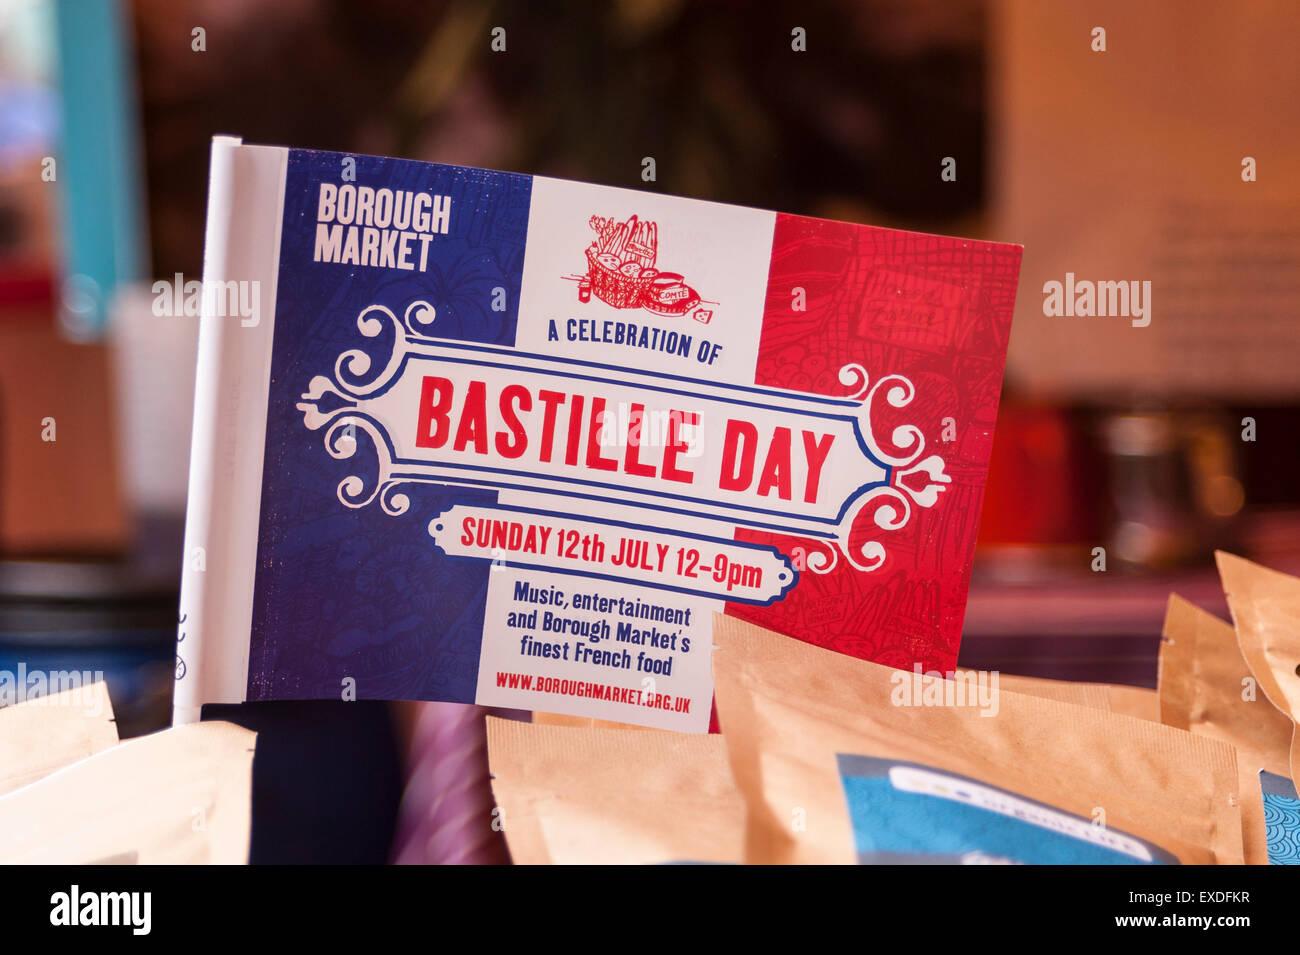 London, UK  12 July 2015  Francophiles gather to enjoy the